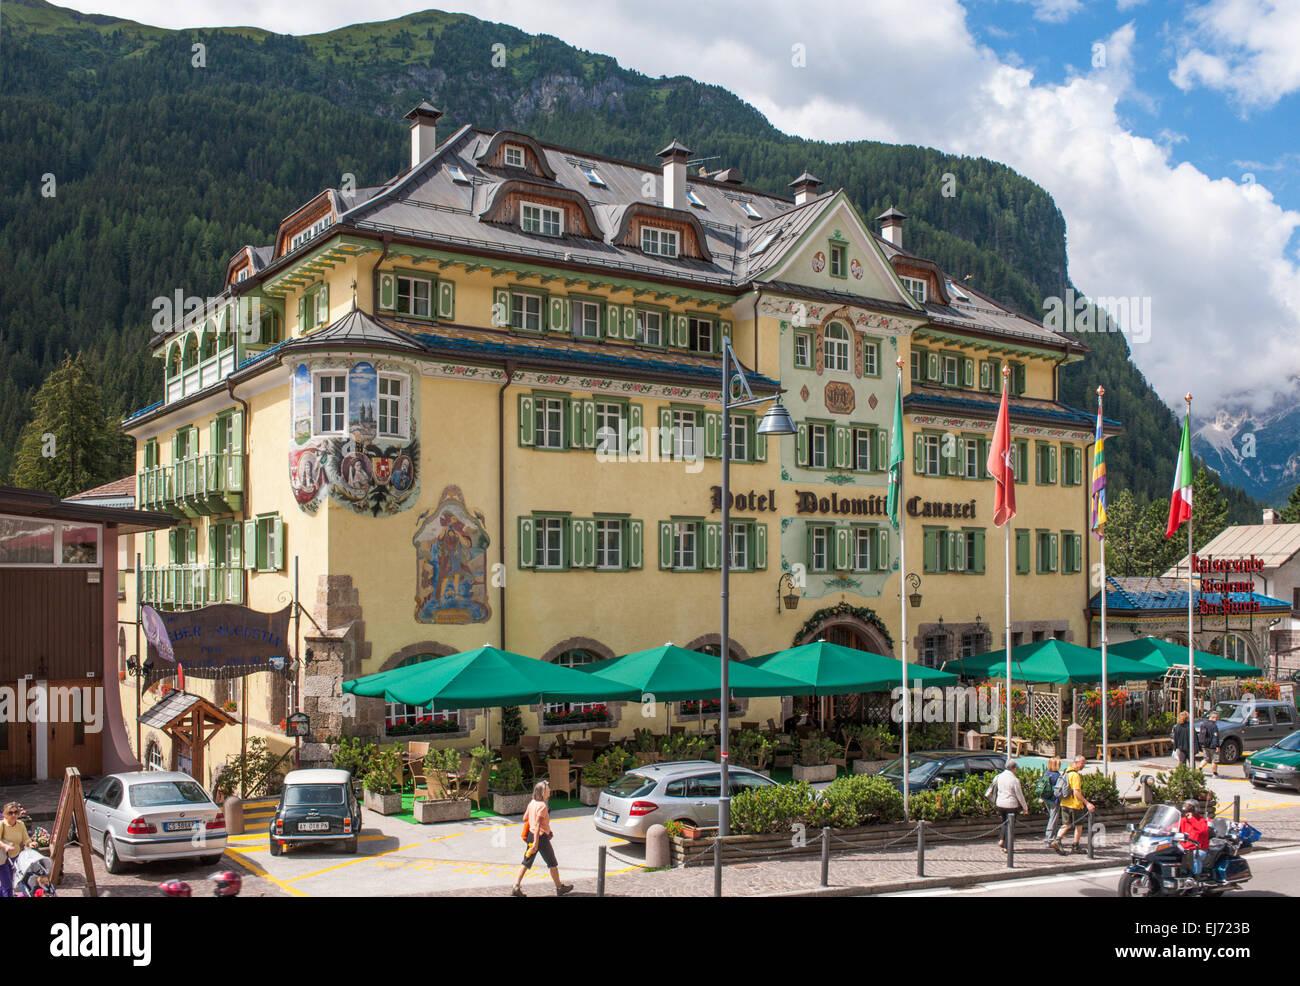 Hotel Dolomiti, Canazei, Trentino-Alto Adige, Italy - Stock Image